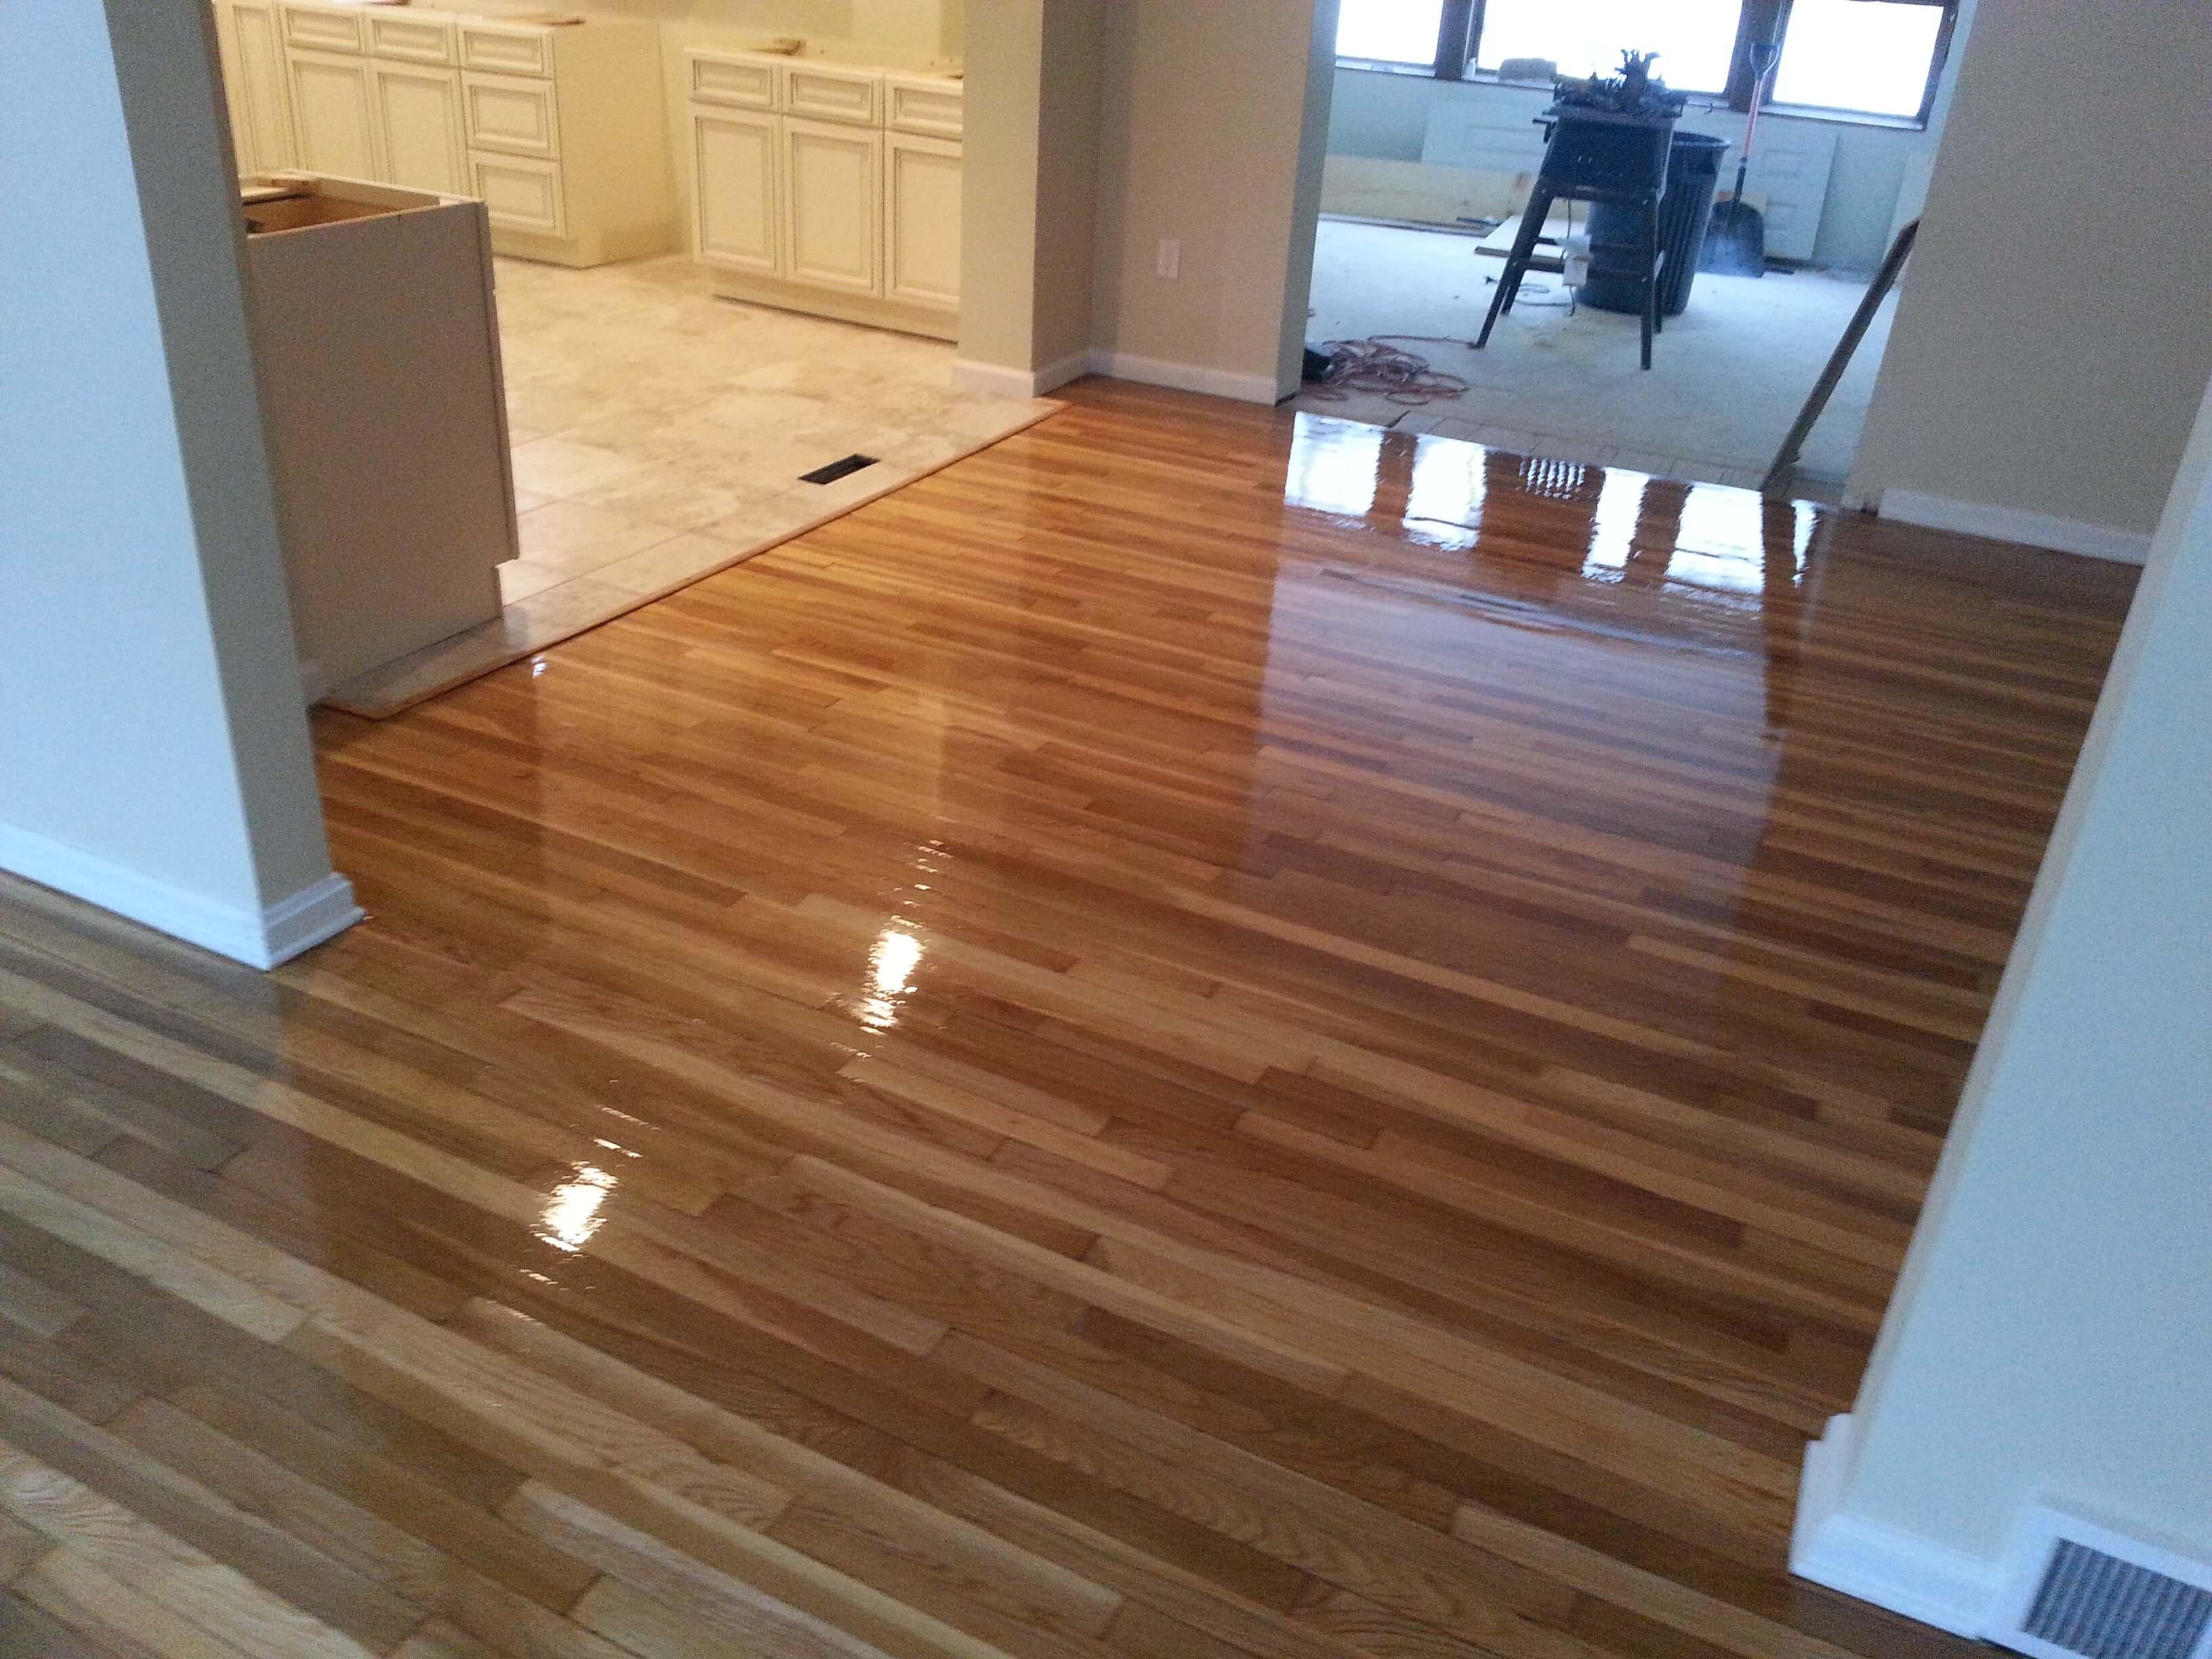 Trenton before and after hardwood floor resurfacing